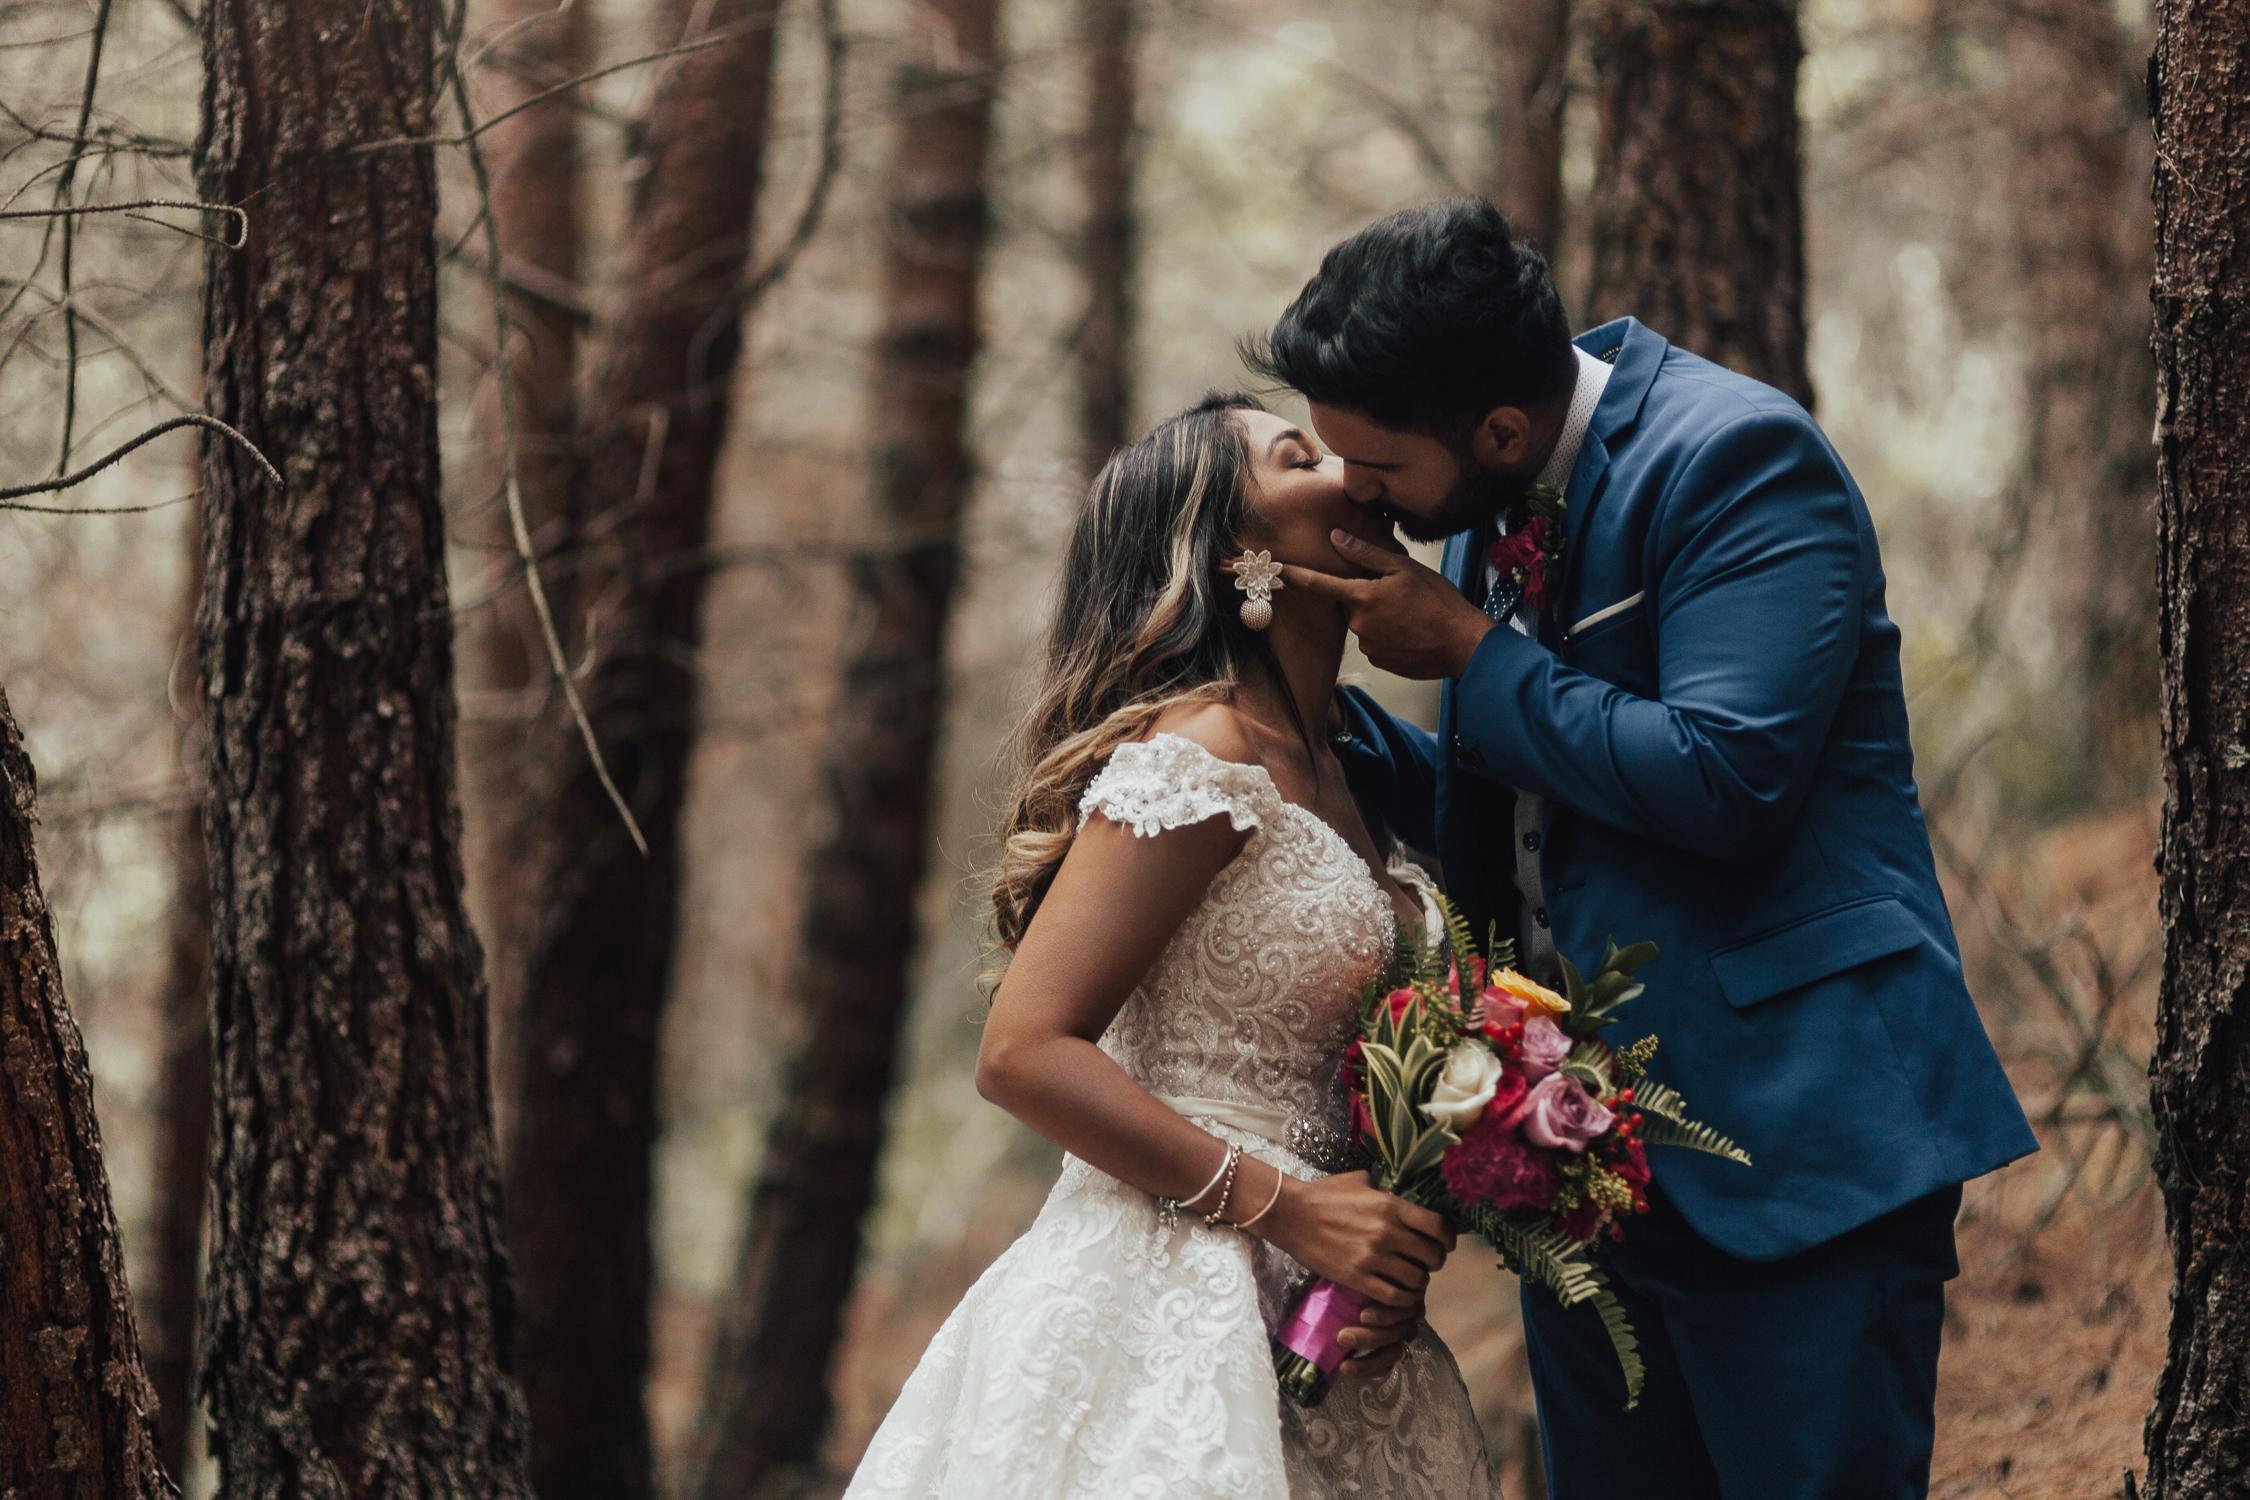 Michelle-Agurto-Fotografia-Bodas-Destination-Wedding-Photographer-Ecuador-Sesion-Johanna-Eduardo-53.JPG